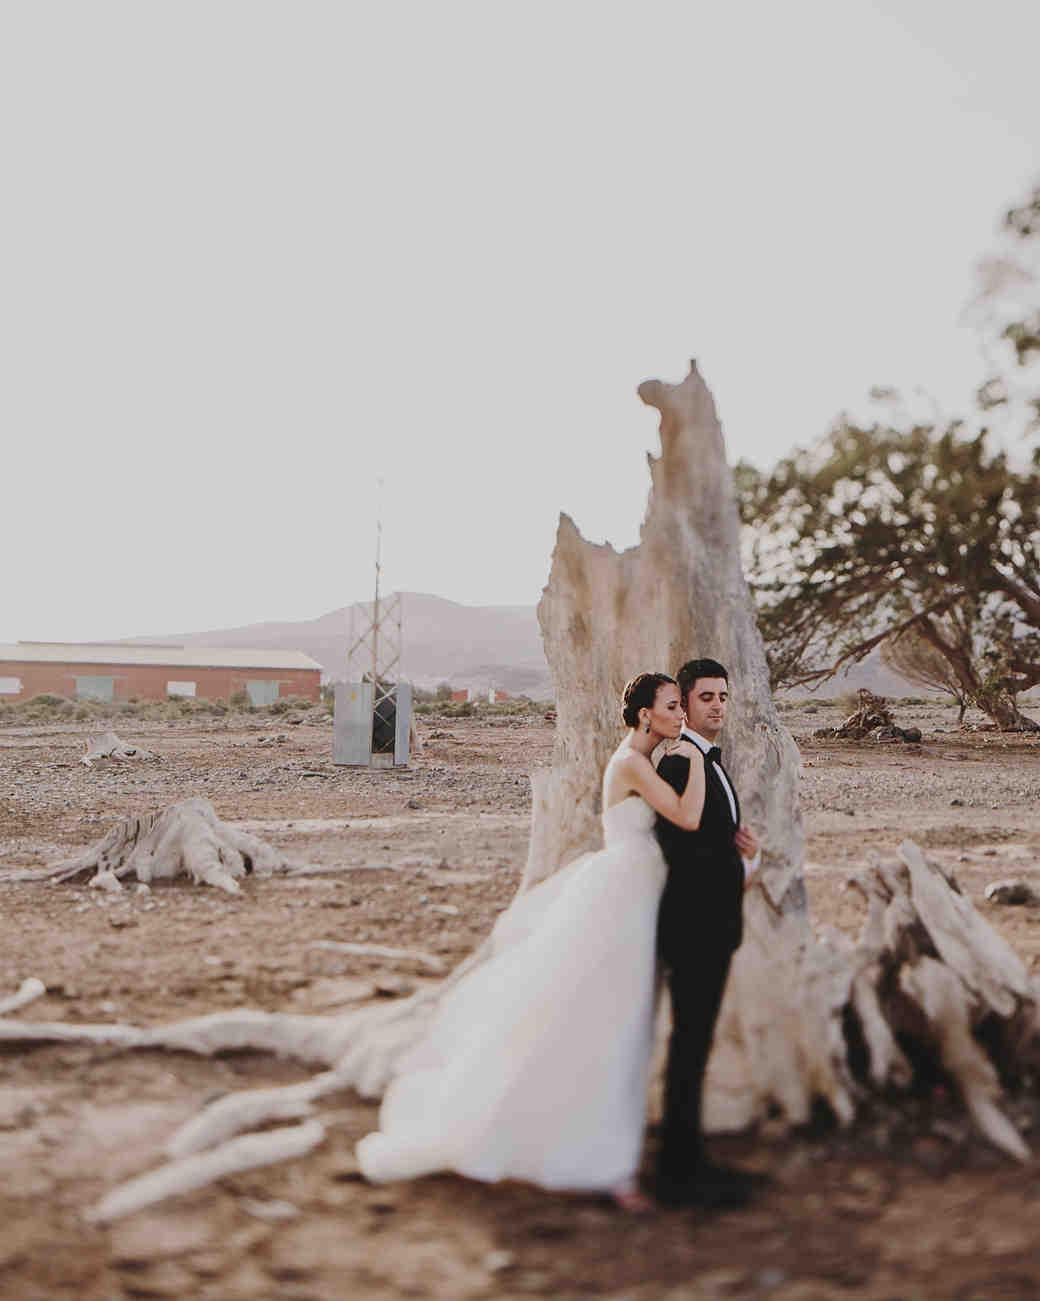 tamara-brett-wedding-couple-0871-s112120-0915.jpg